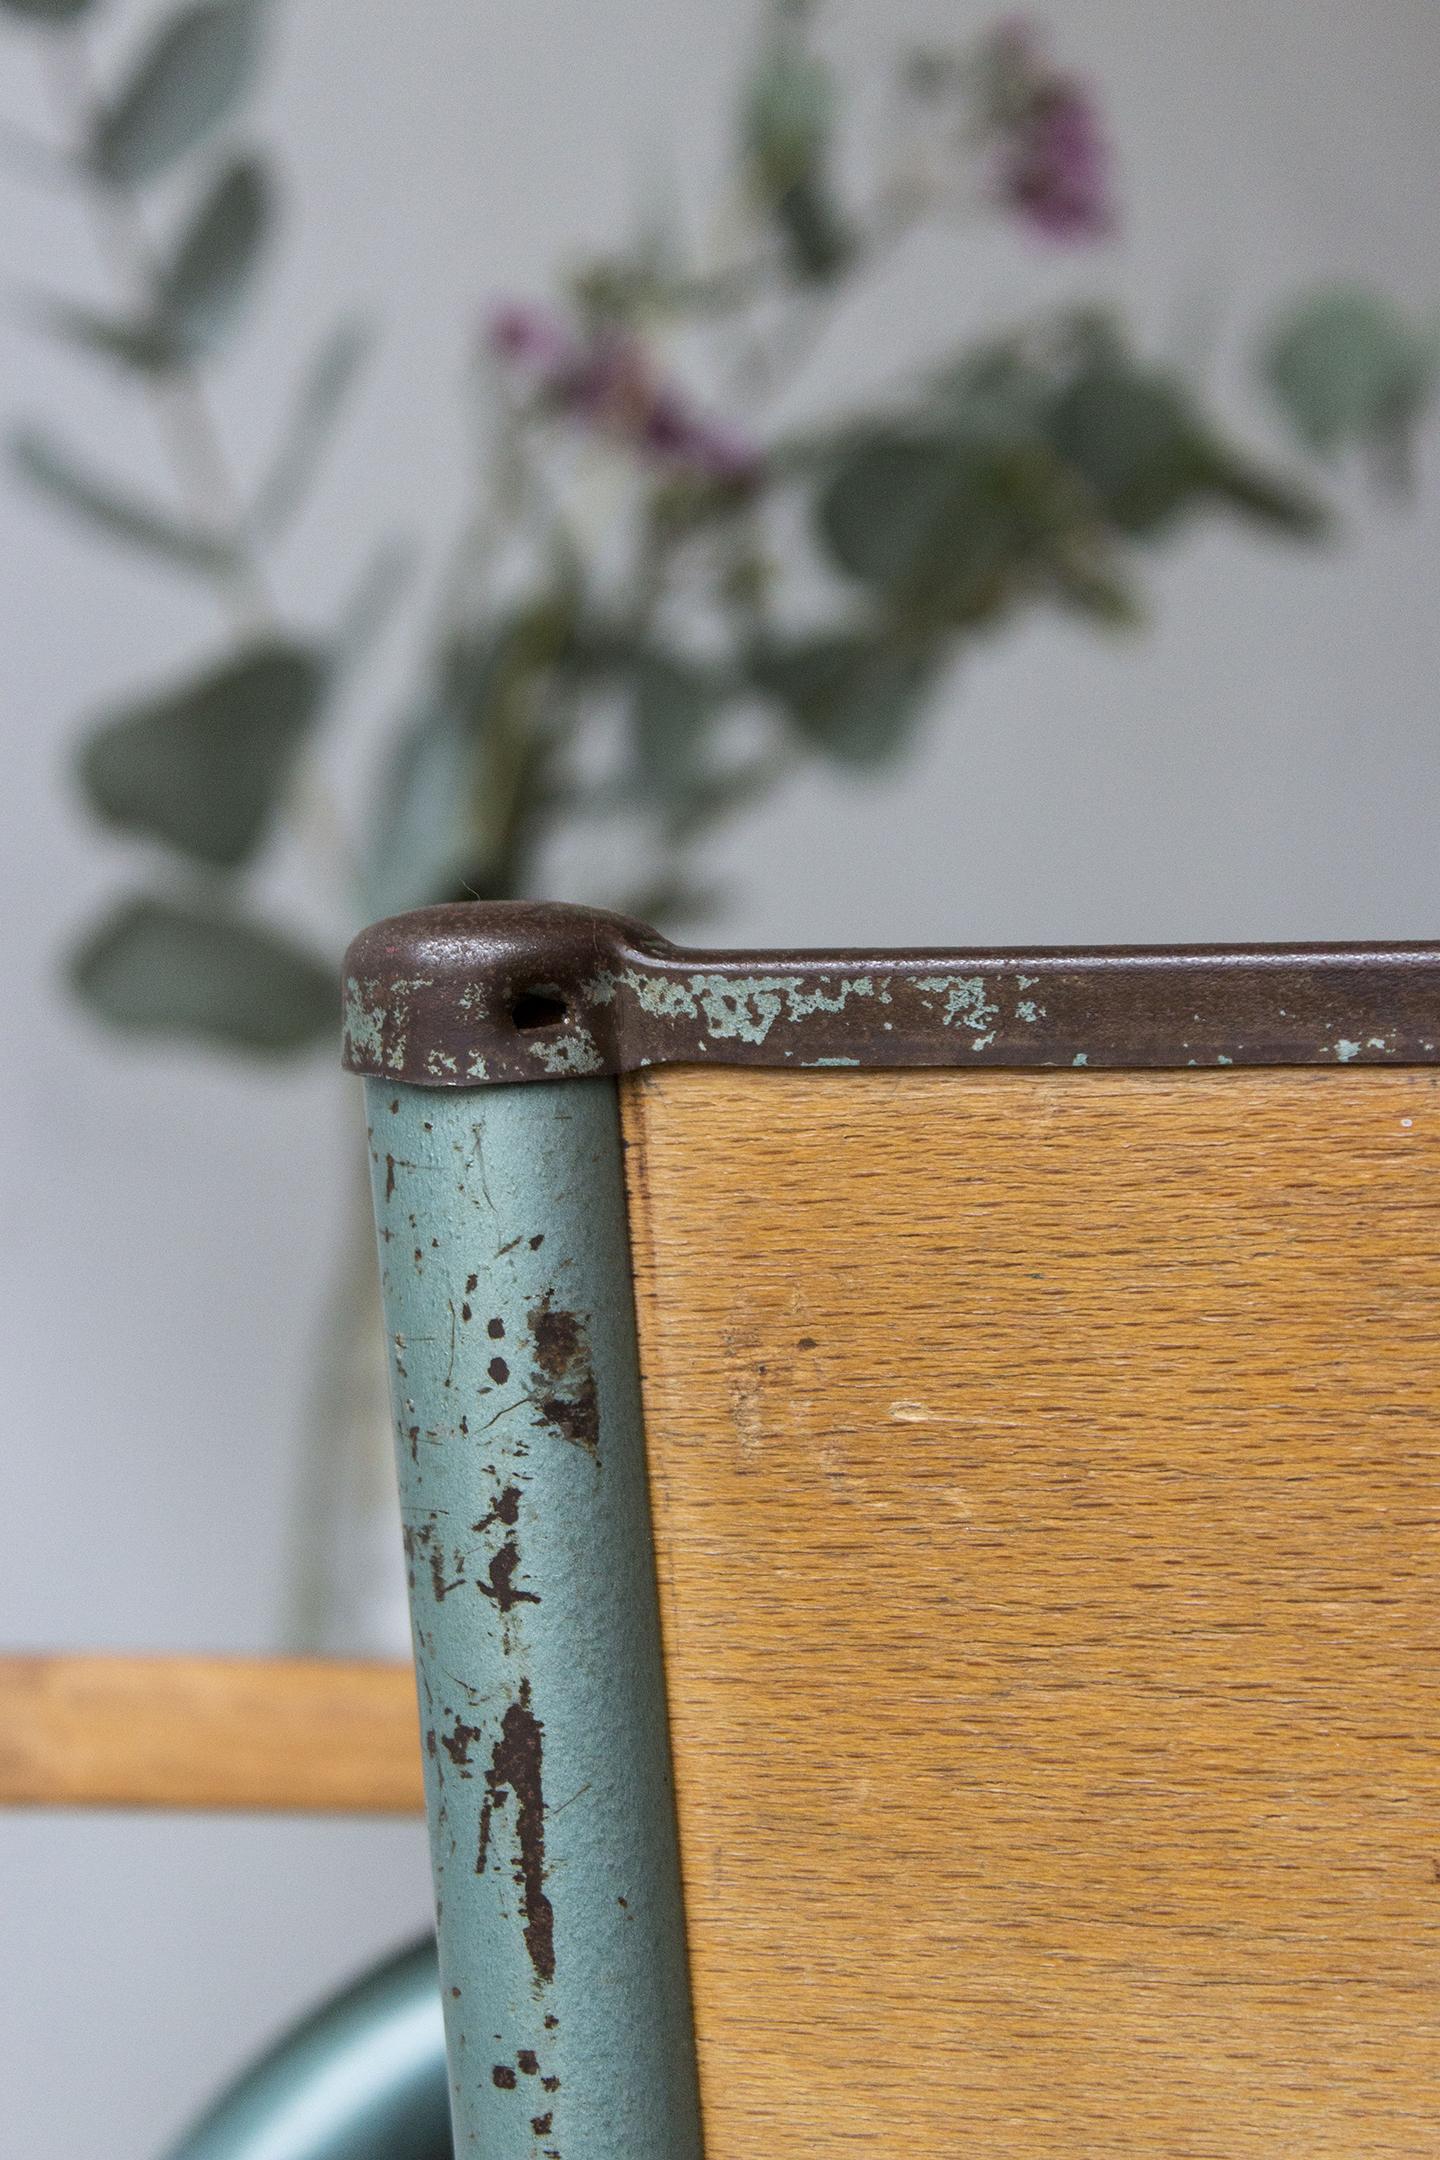 3176 - 1p vintage schooltafel met groen frame - Firma zoethout_4.jpg